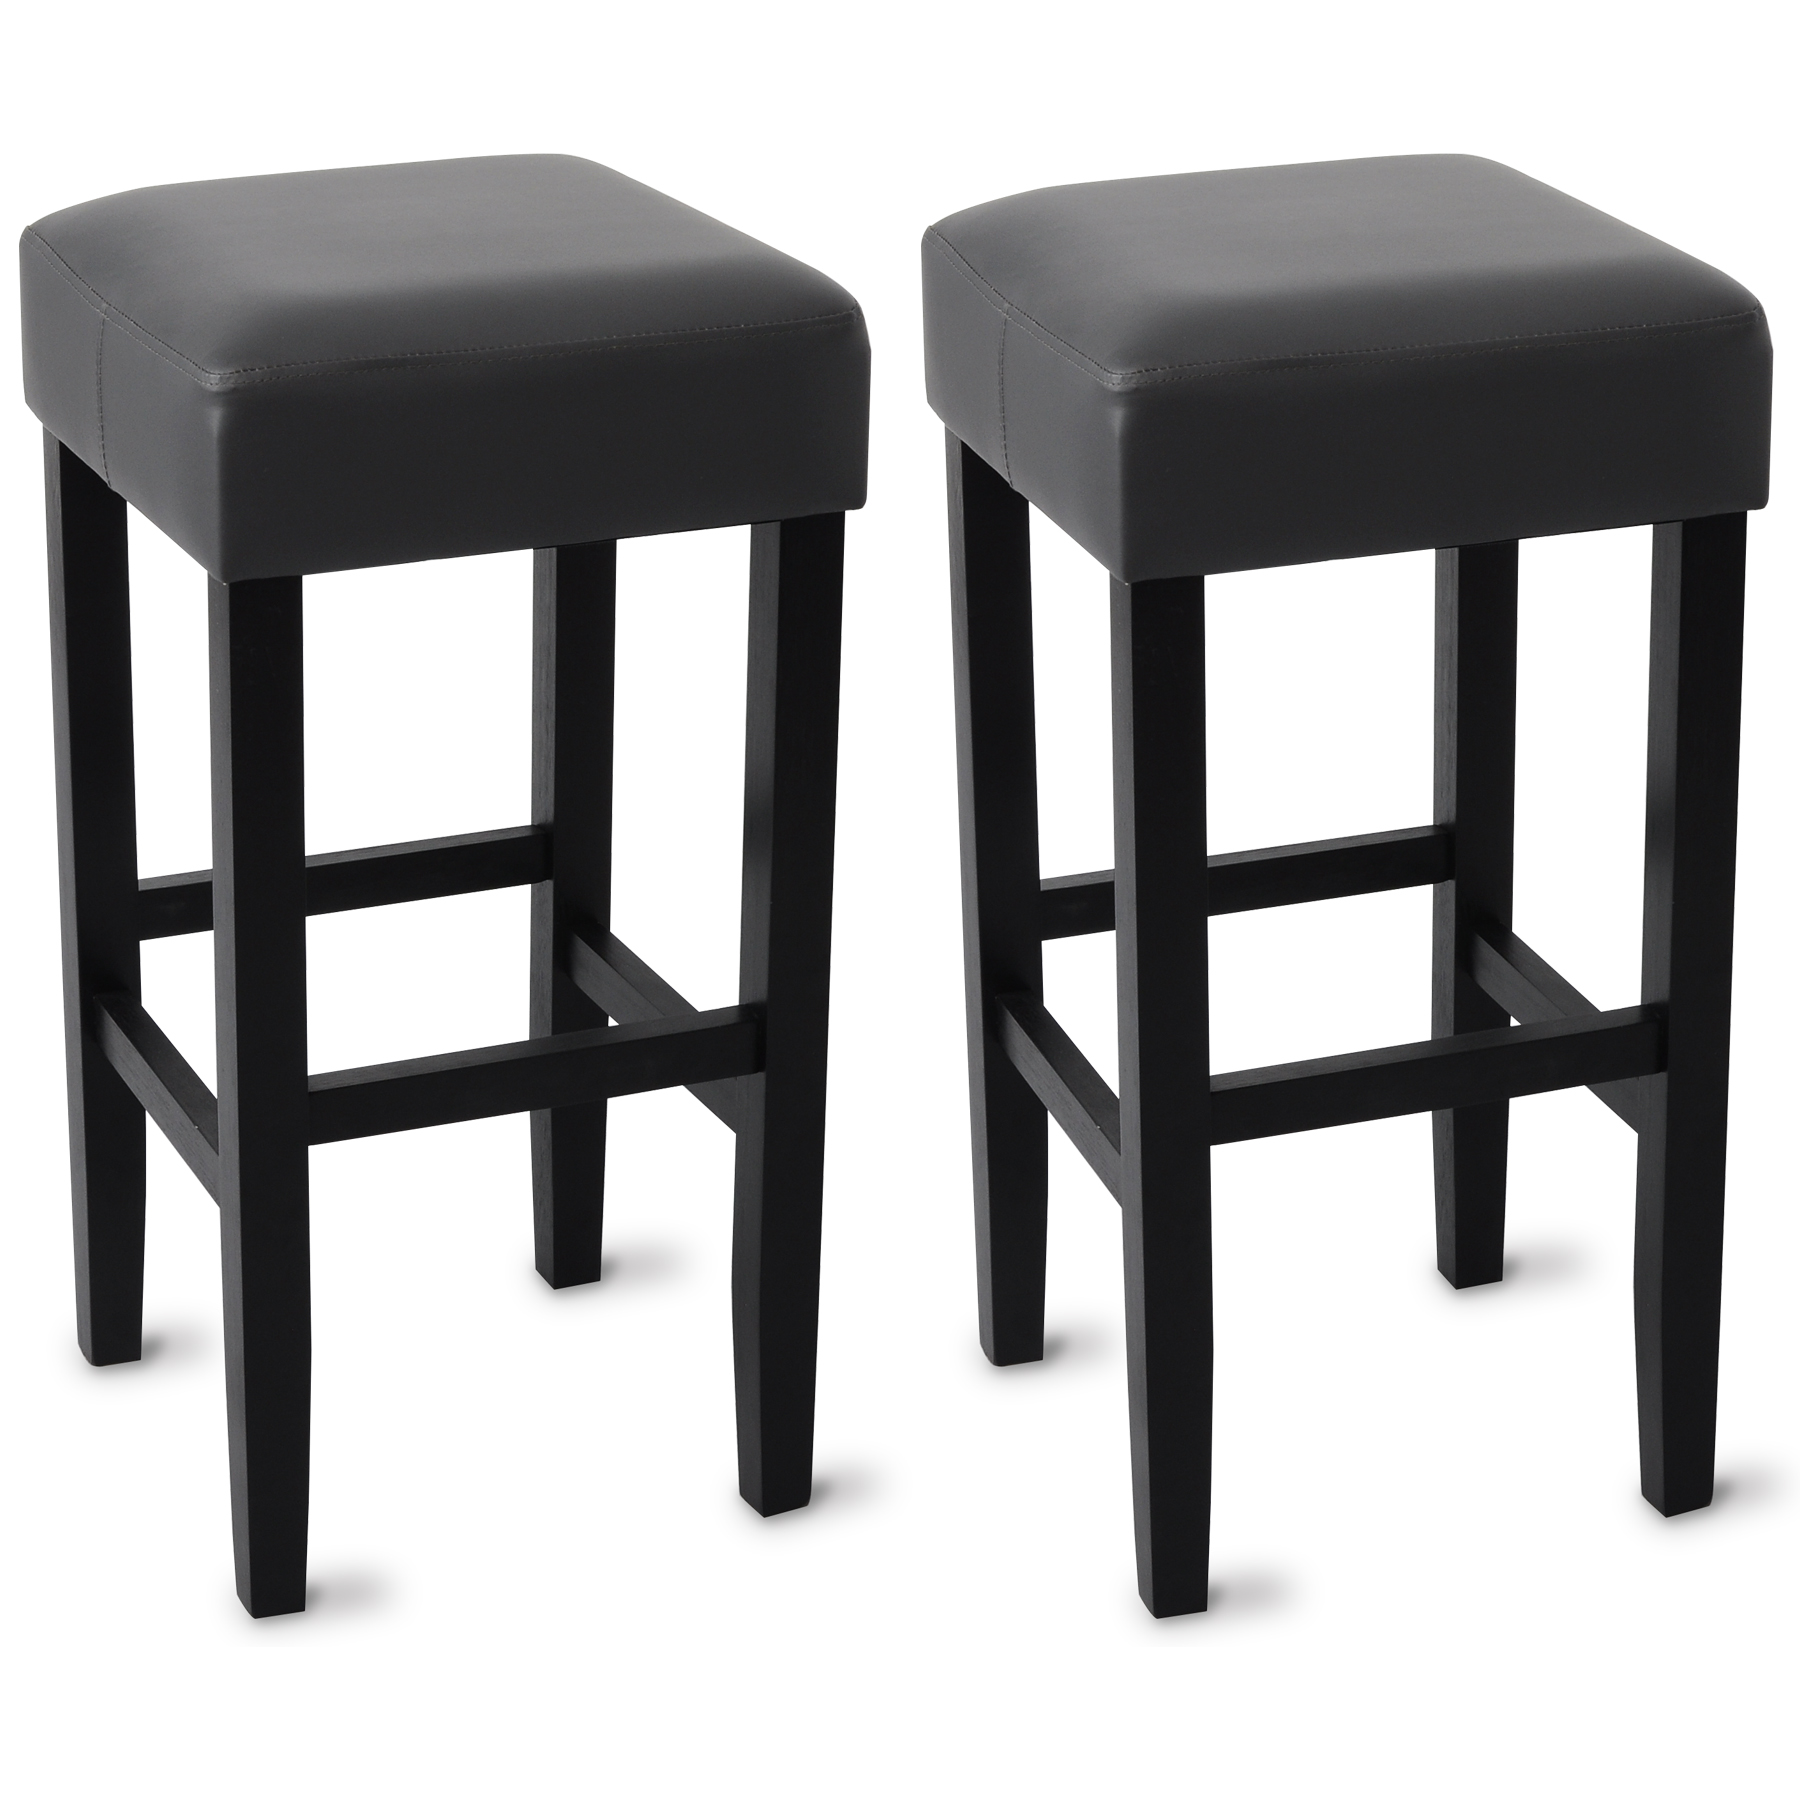 barhocker 2er tresenstuhl gepolstert massivholz kunstleder hocker grau bh22gr 2 ebay. Black Bedroom Furniture Sets. Home Design Ideas